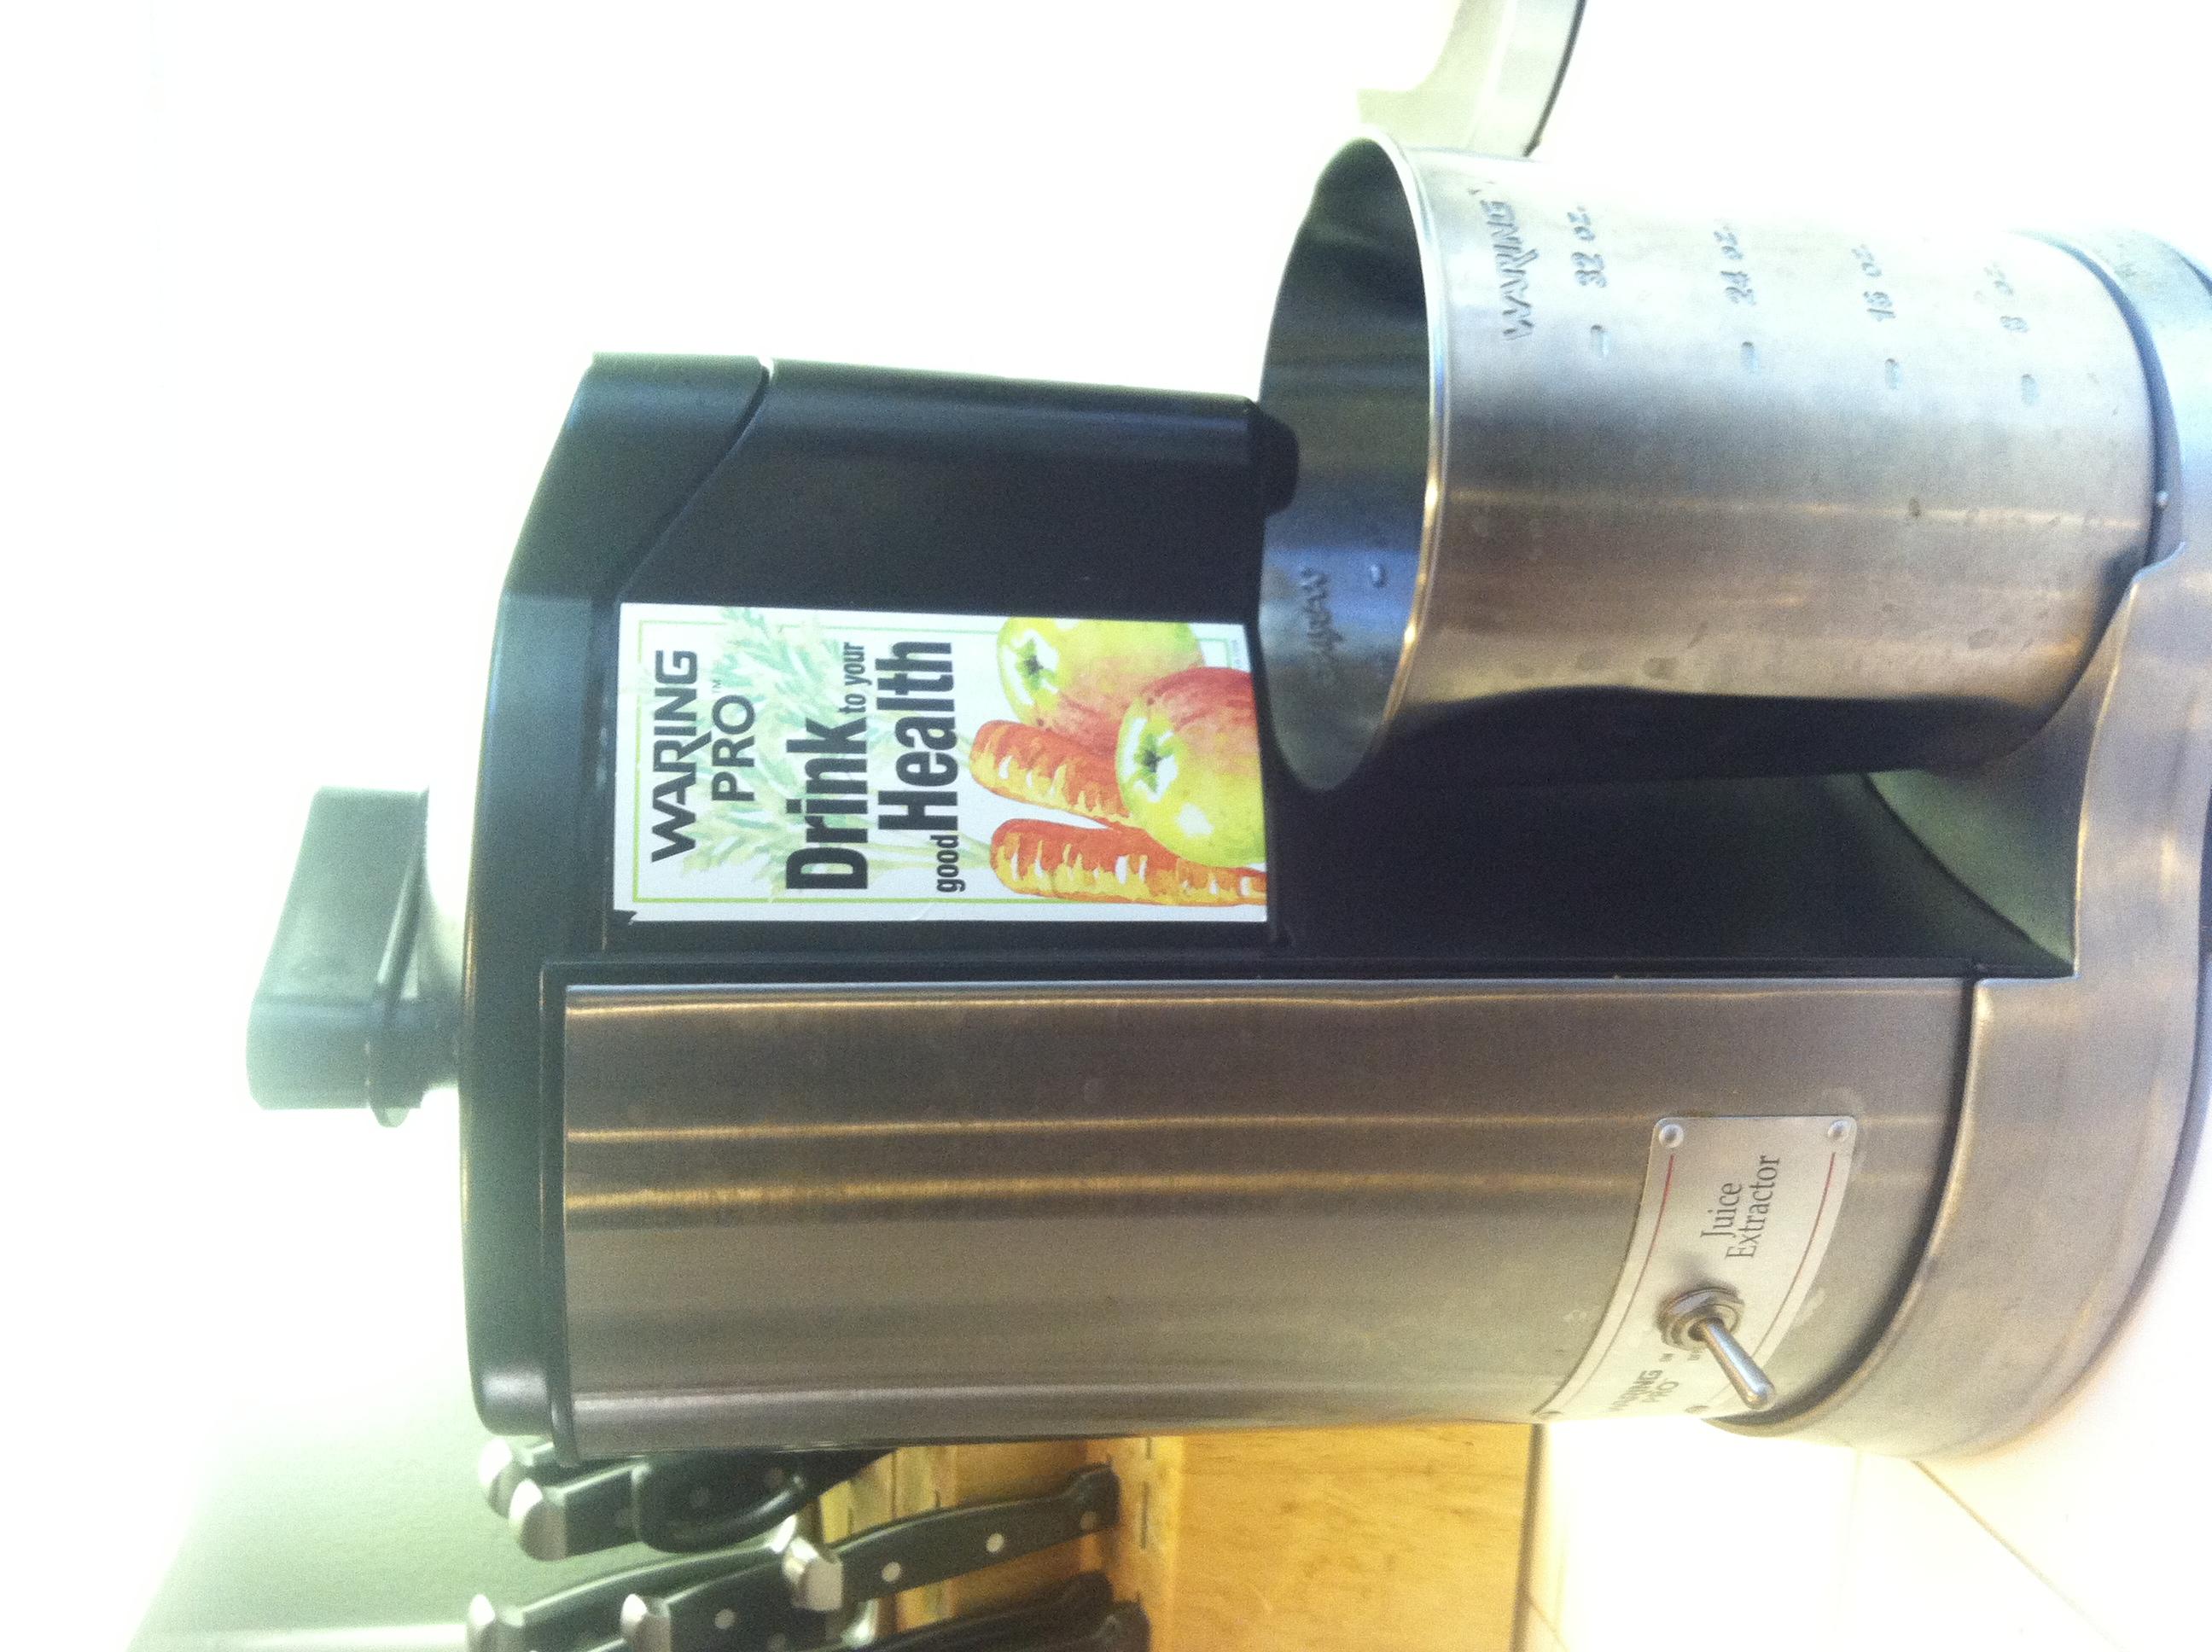 My centrifrugal juicer